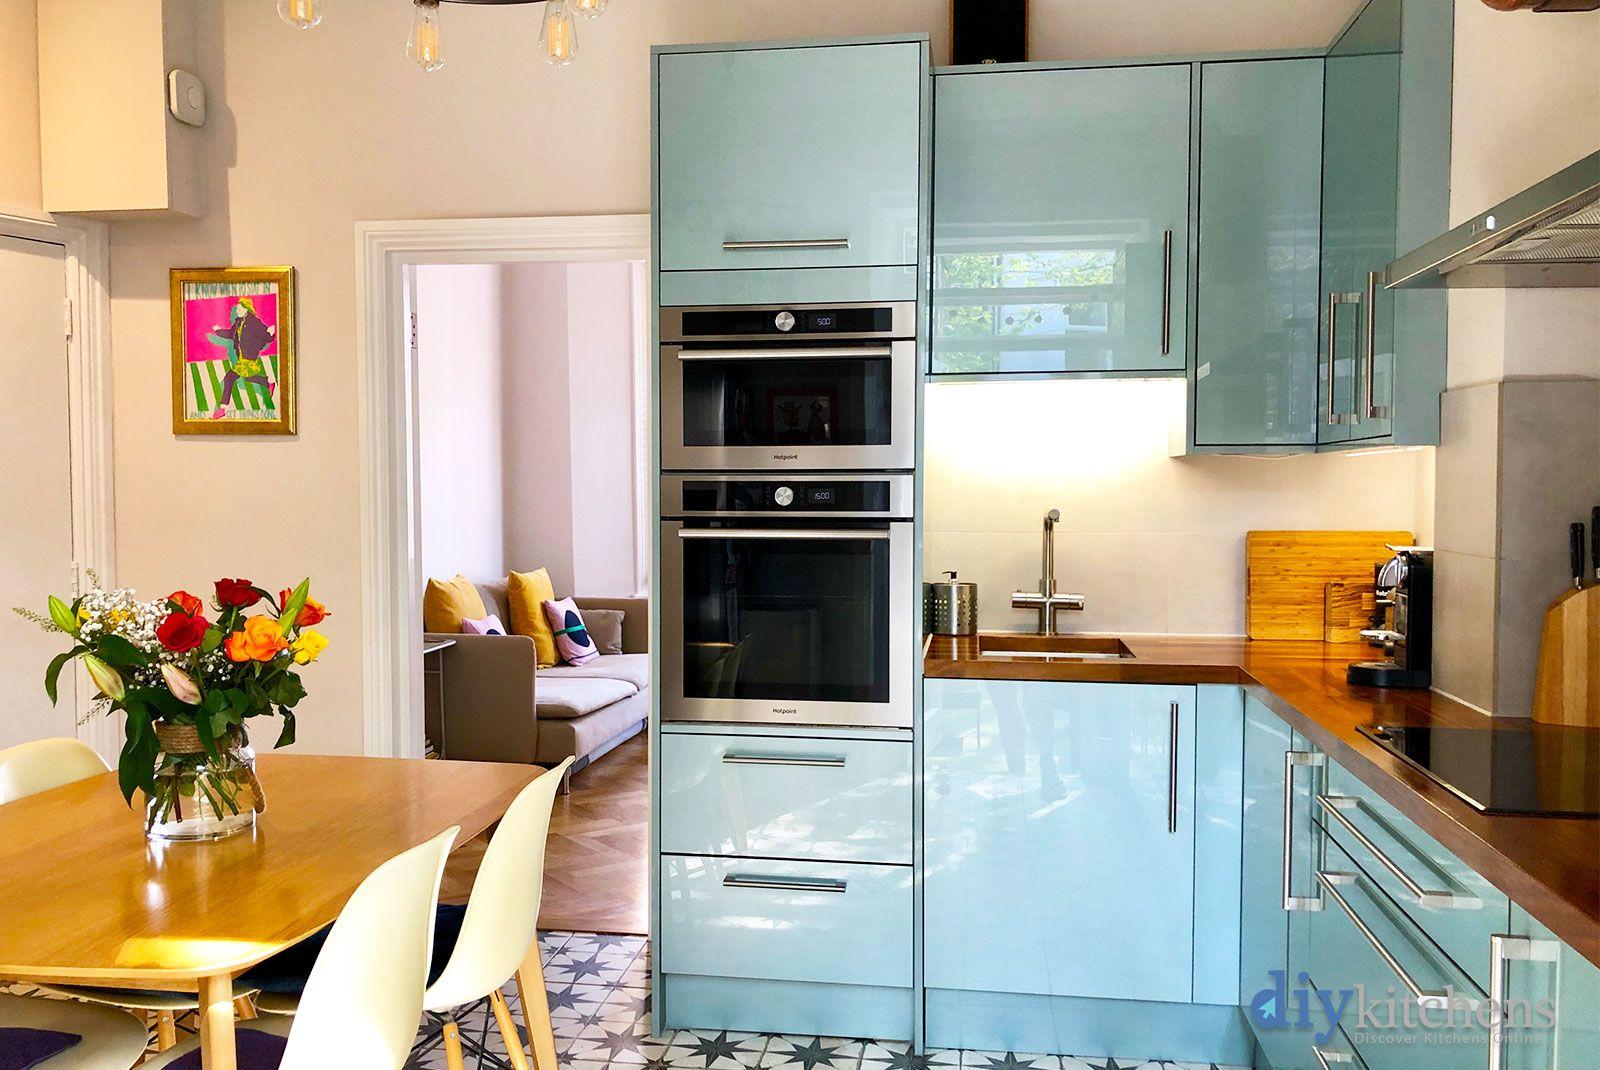 Beautiful Modern Ikea Kitchen Fronts Ringhult High Gloss White Ikeakitchen Kitchen Ikea Install Em 2020 Cozinhas Domesticas Cozinhas Modernas Interior De Cozinha